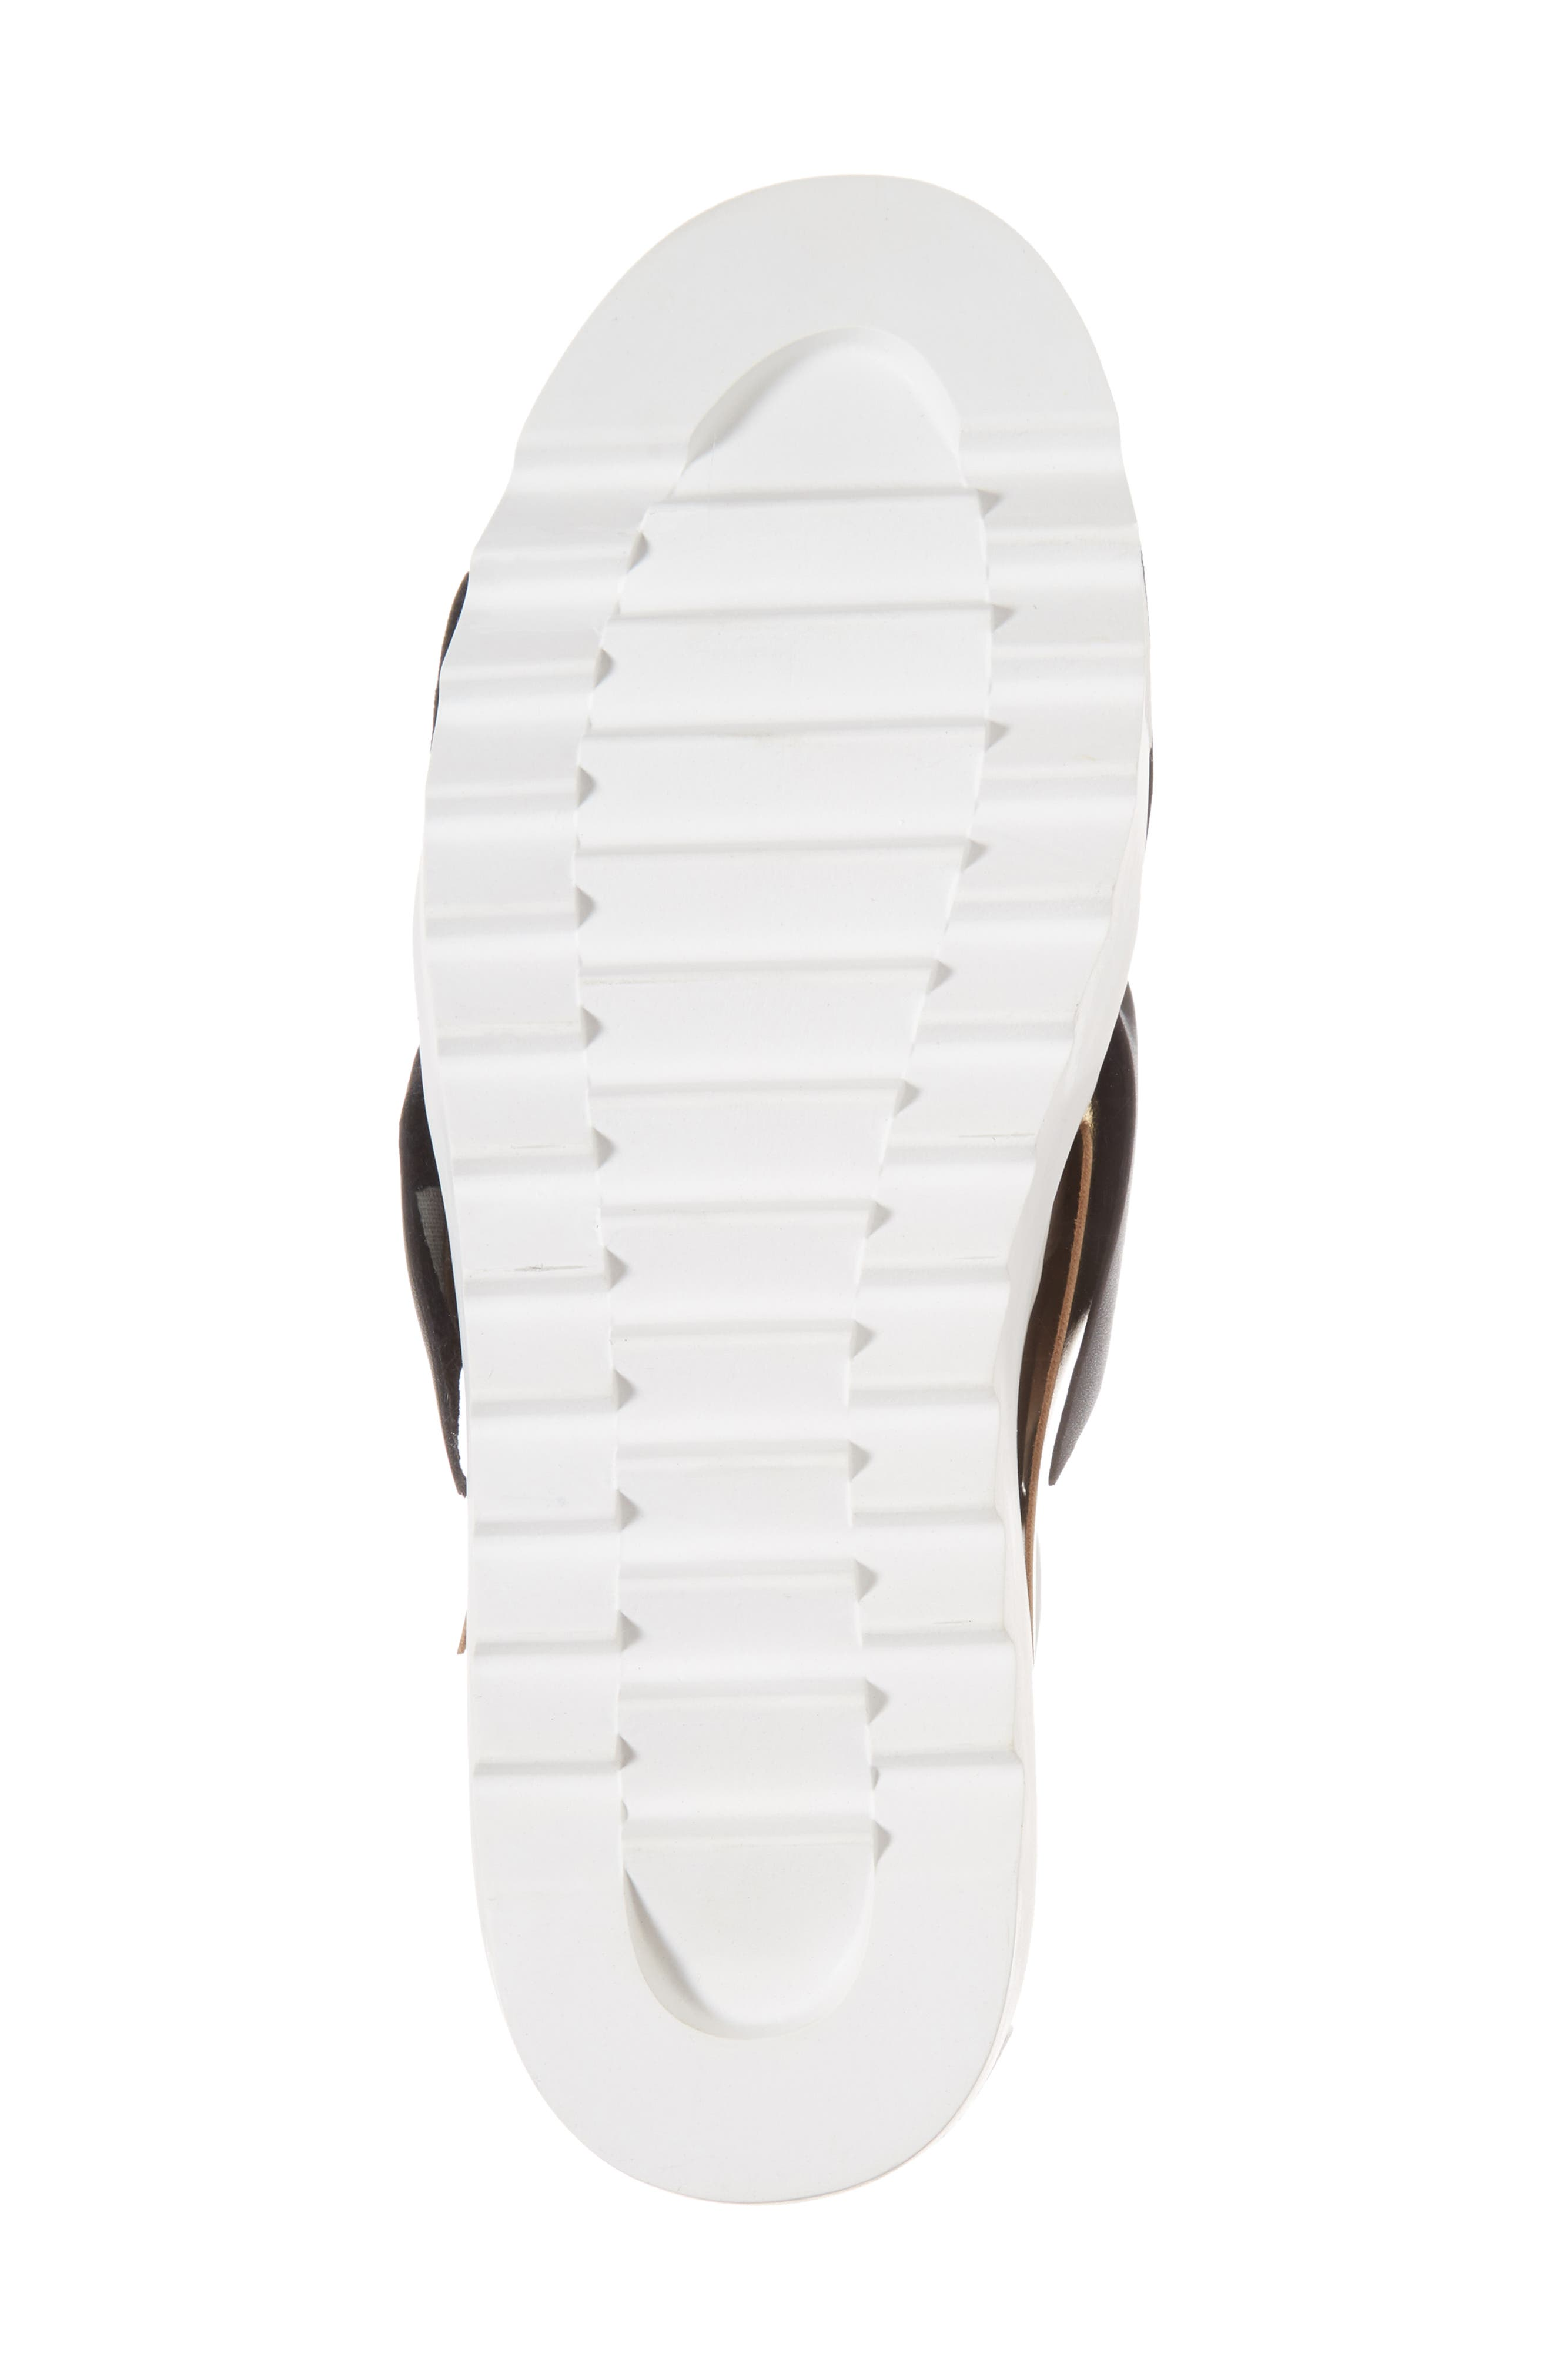 Sadie Ruffle Platform Sneaker,                             Alternate thumbnail 6, color,                             WHITE LEATHER